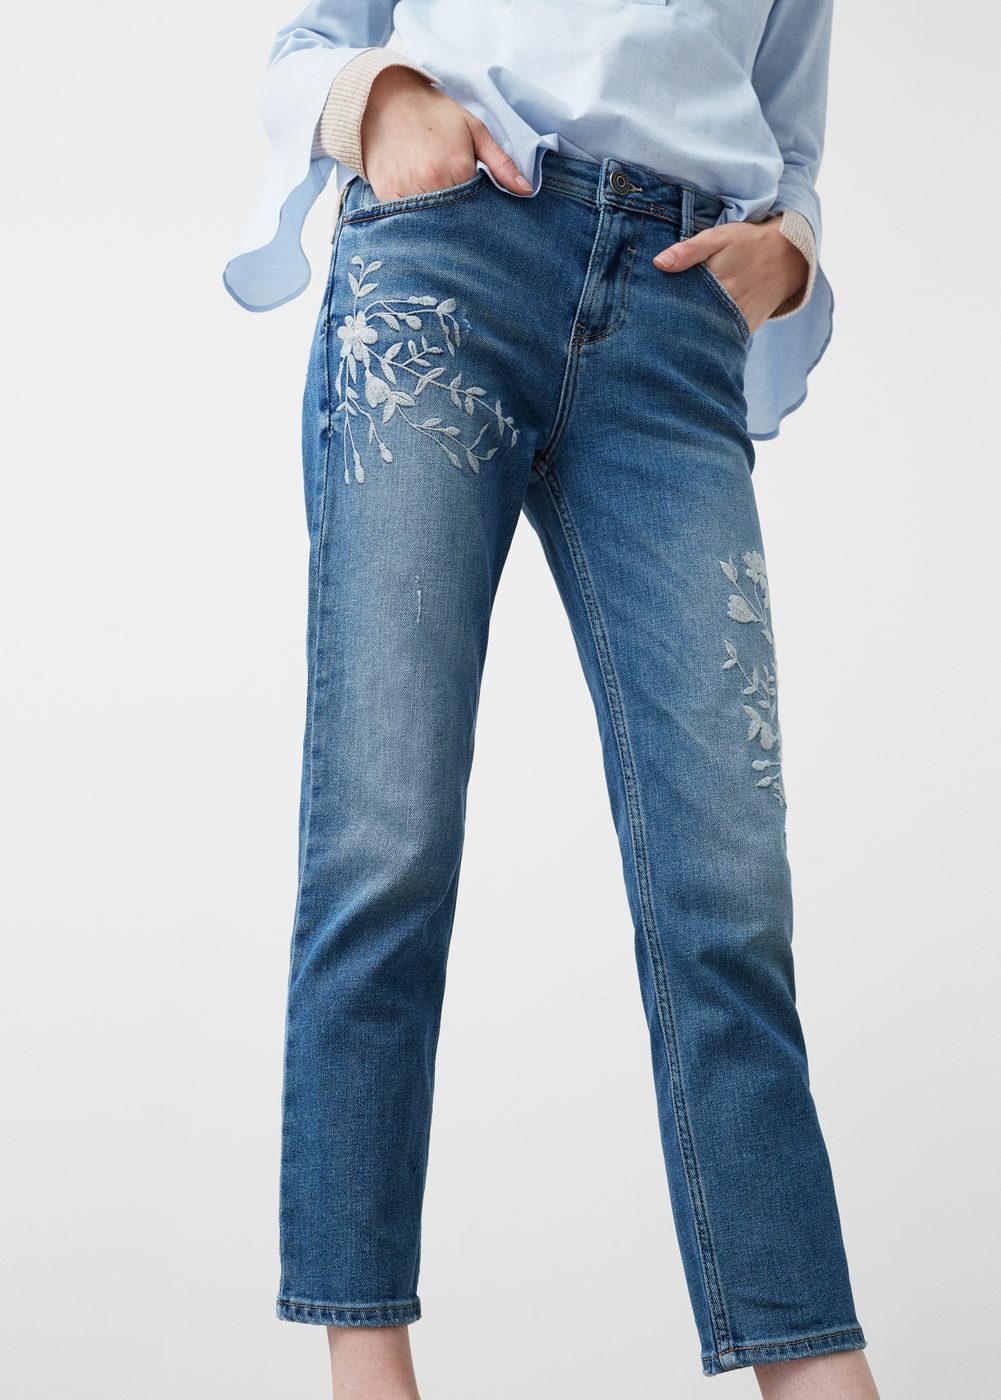 Mango Croatia Jeans.jpg